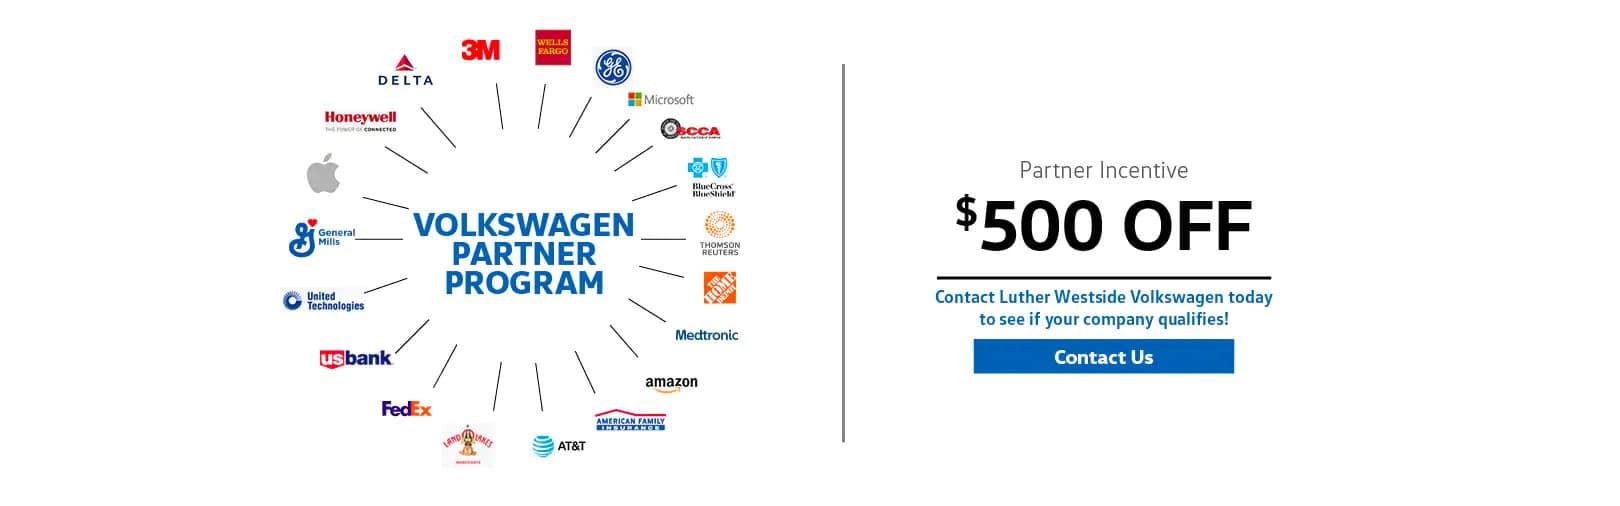 Partners Program